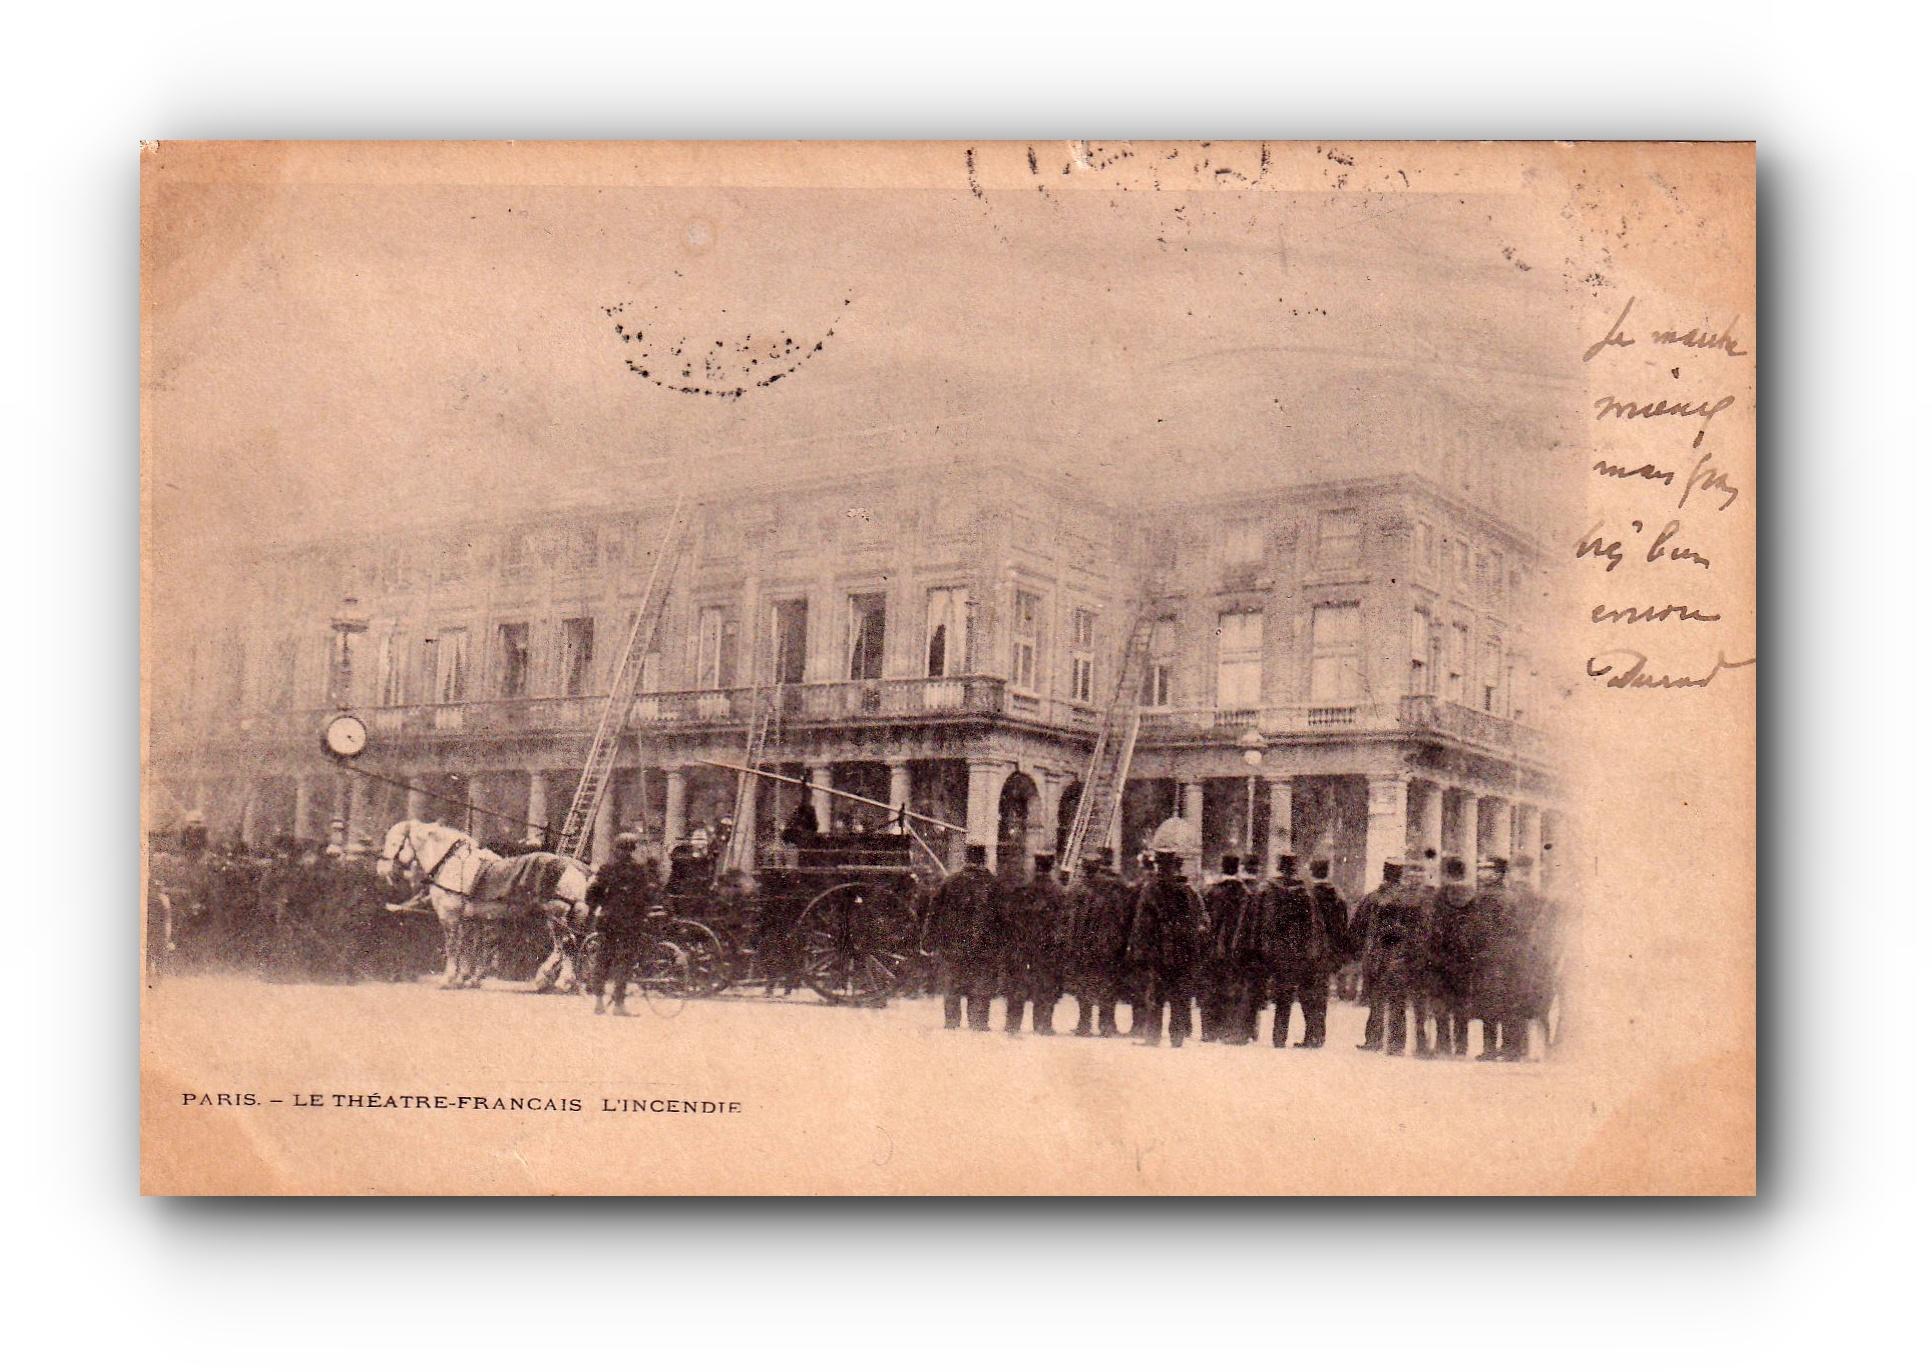 L'incendie du théatre - 08.04.1900 - Brandkatastrophe im Theater - Fire disaster in the theatre